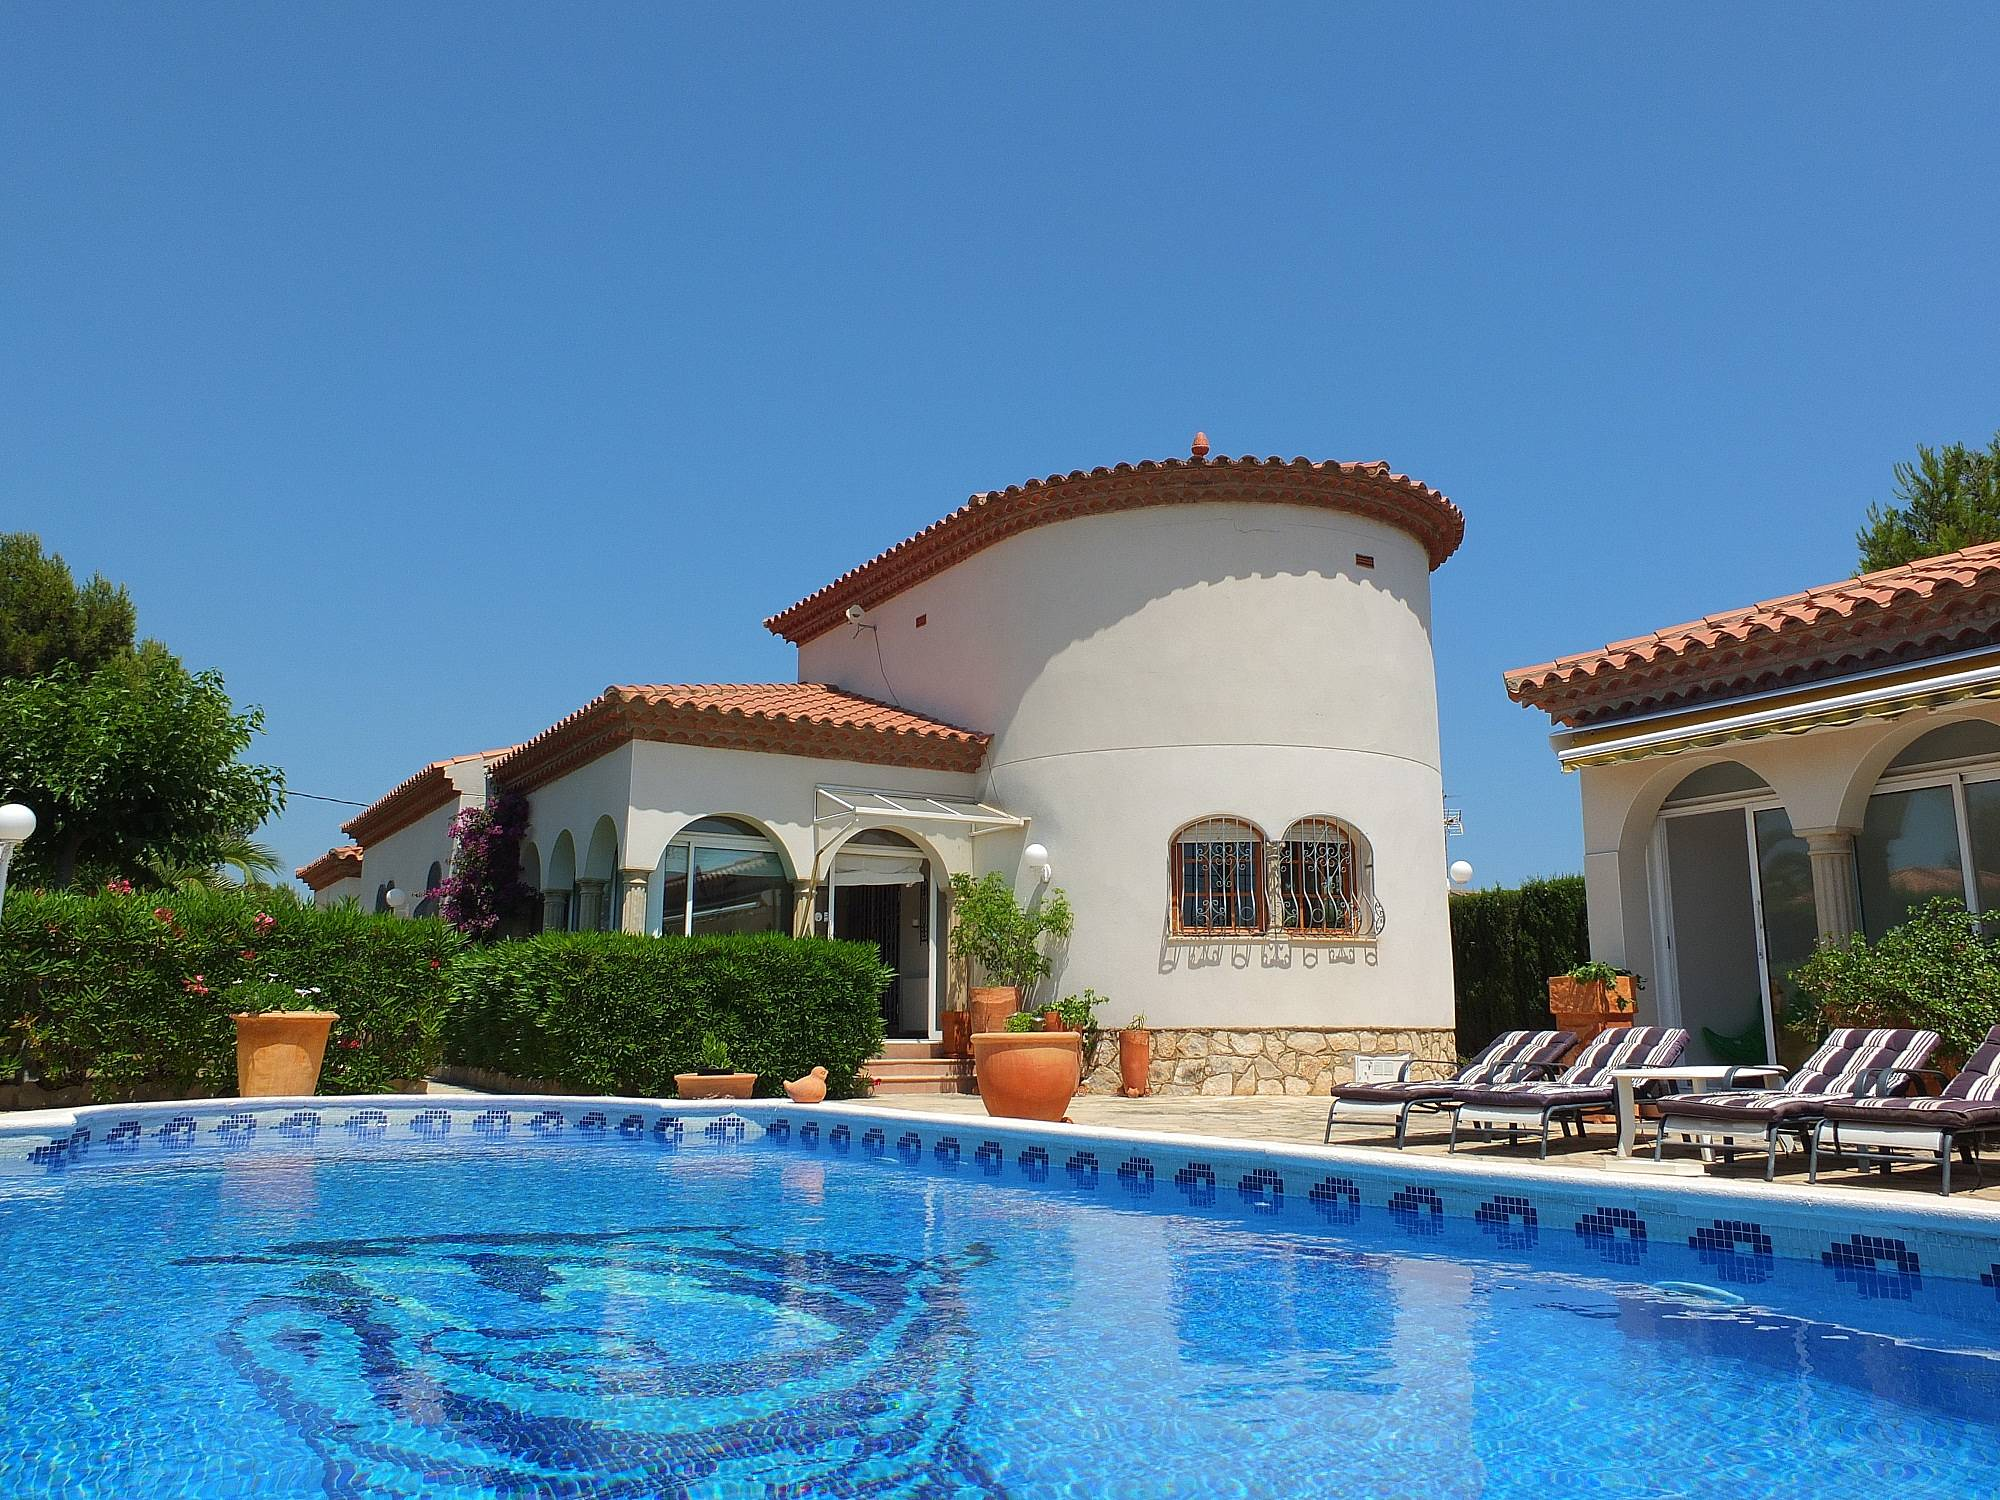 Villa en alquiler a 3 km de la playa tres calas l for Pisos alquiler ametlla de mar